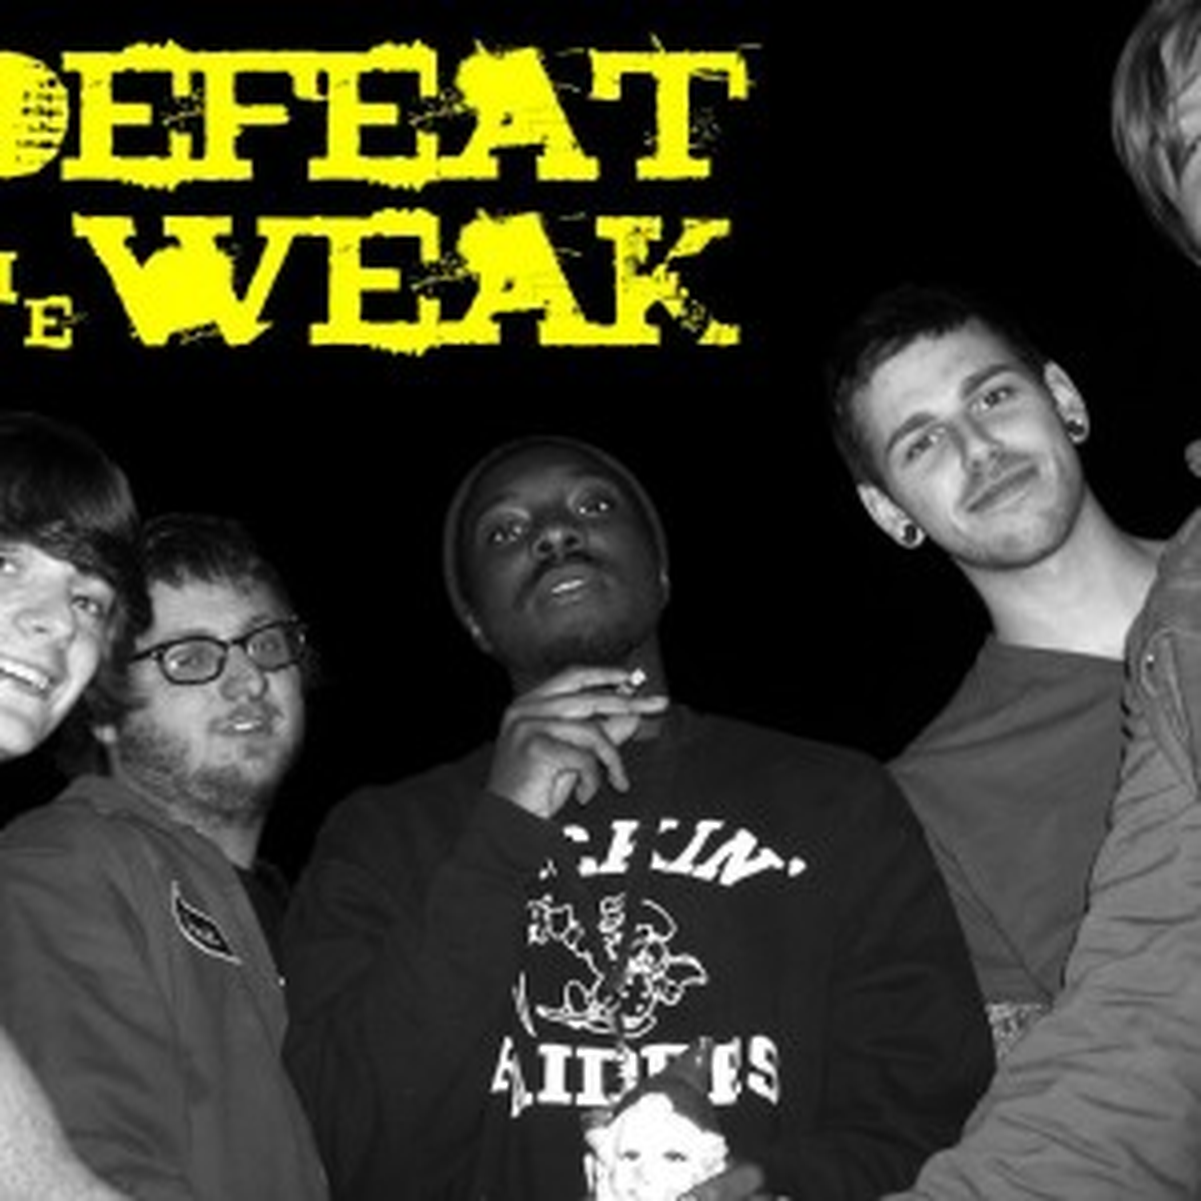 Defeat The Weak